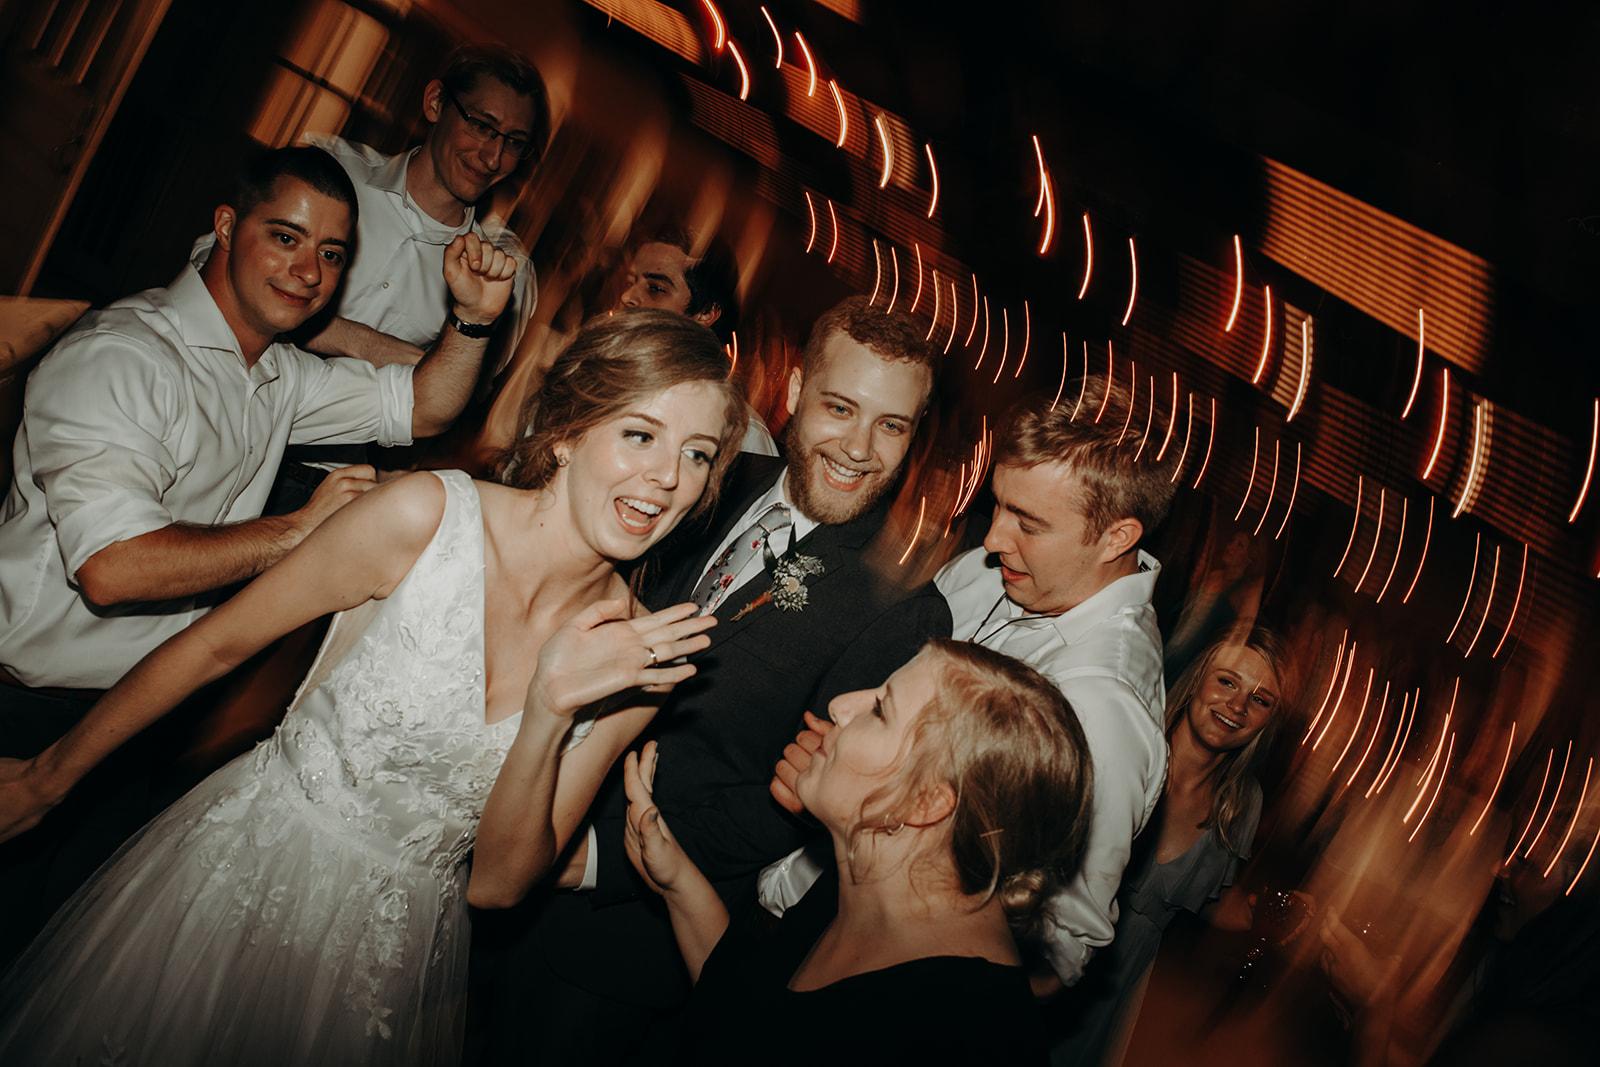 camp_wokanda_peoria_illinois_wedding_photographer_wright_photographs_bliese_1007.jpg